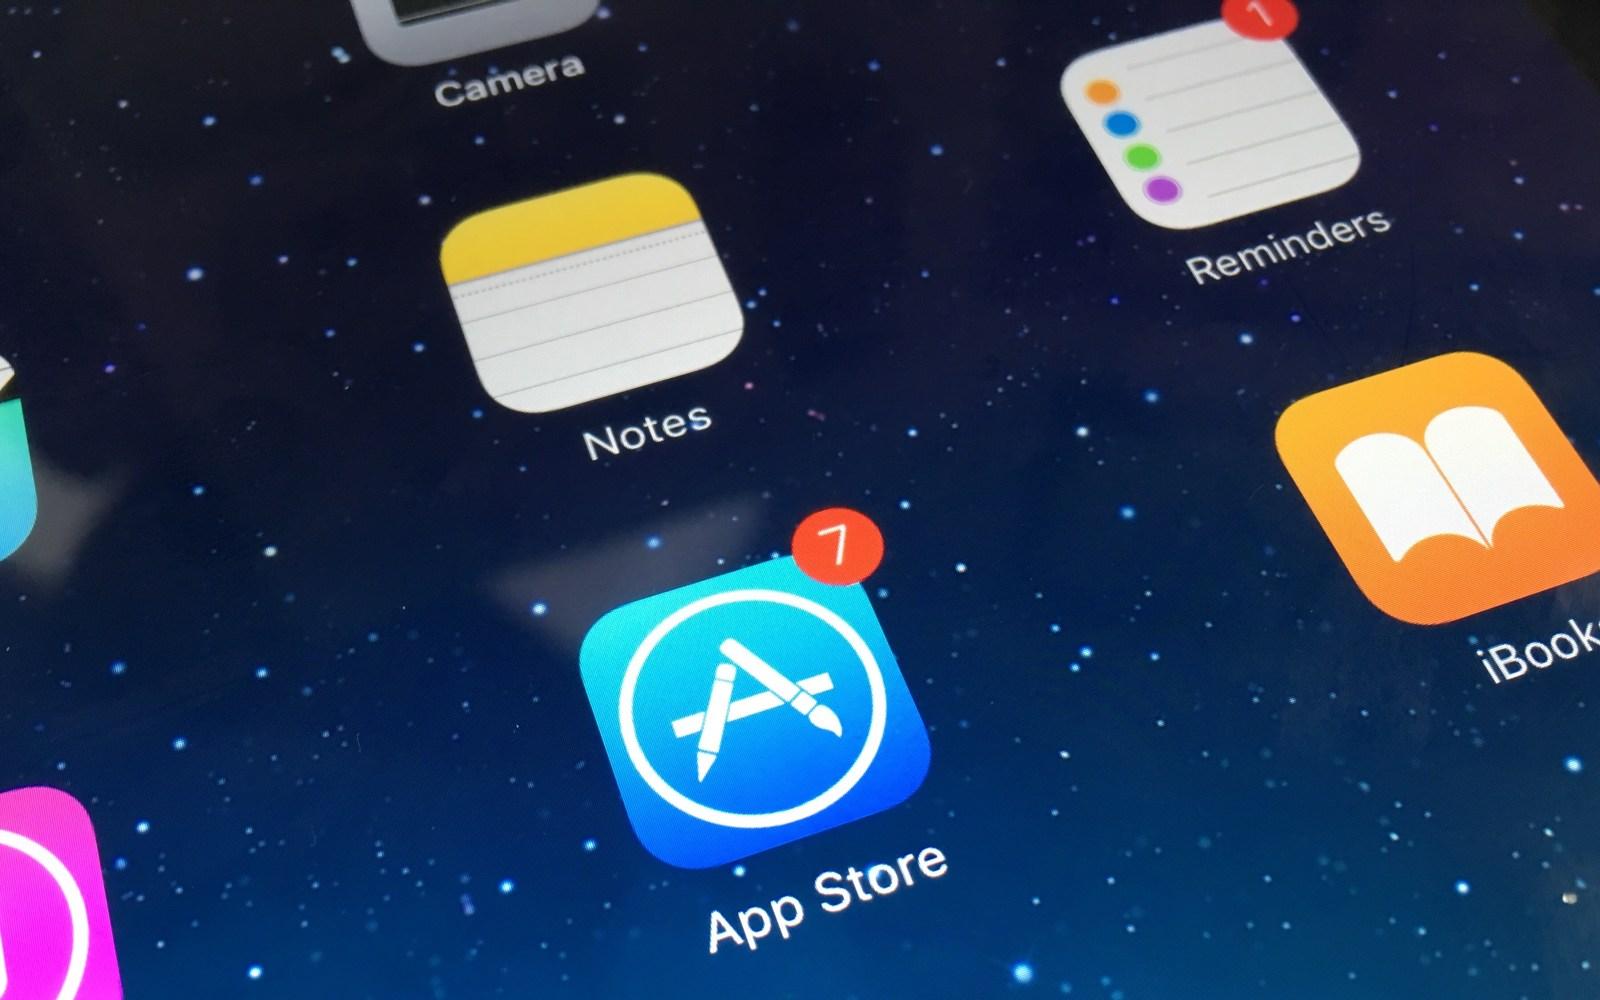 Apple details App Store changes including new subscription revenue split & search result ads